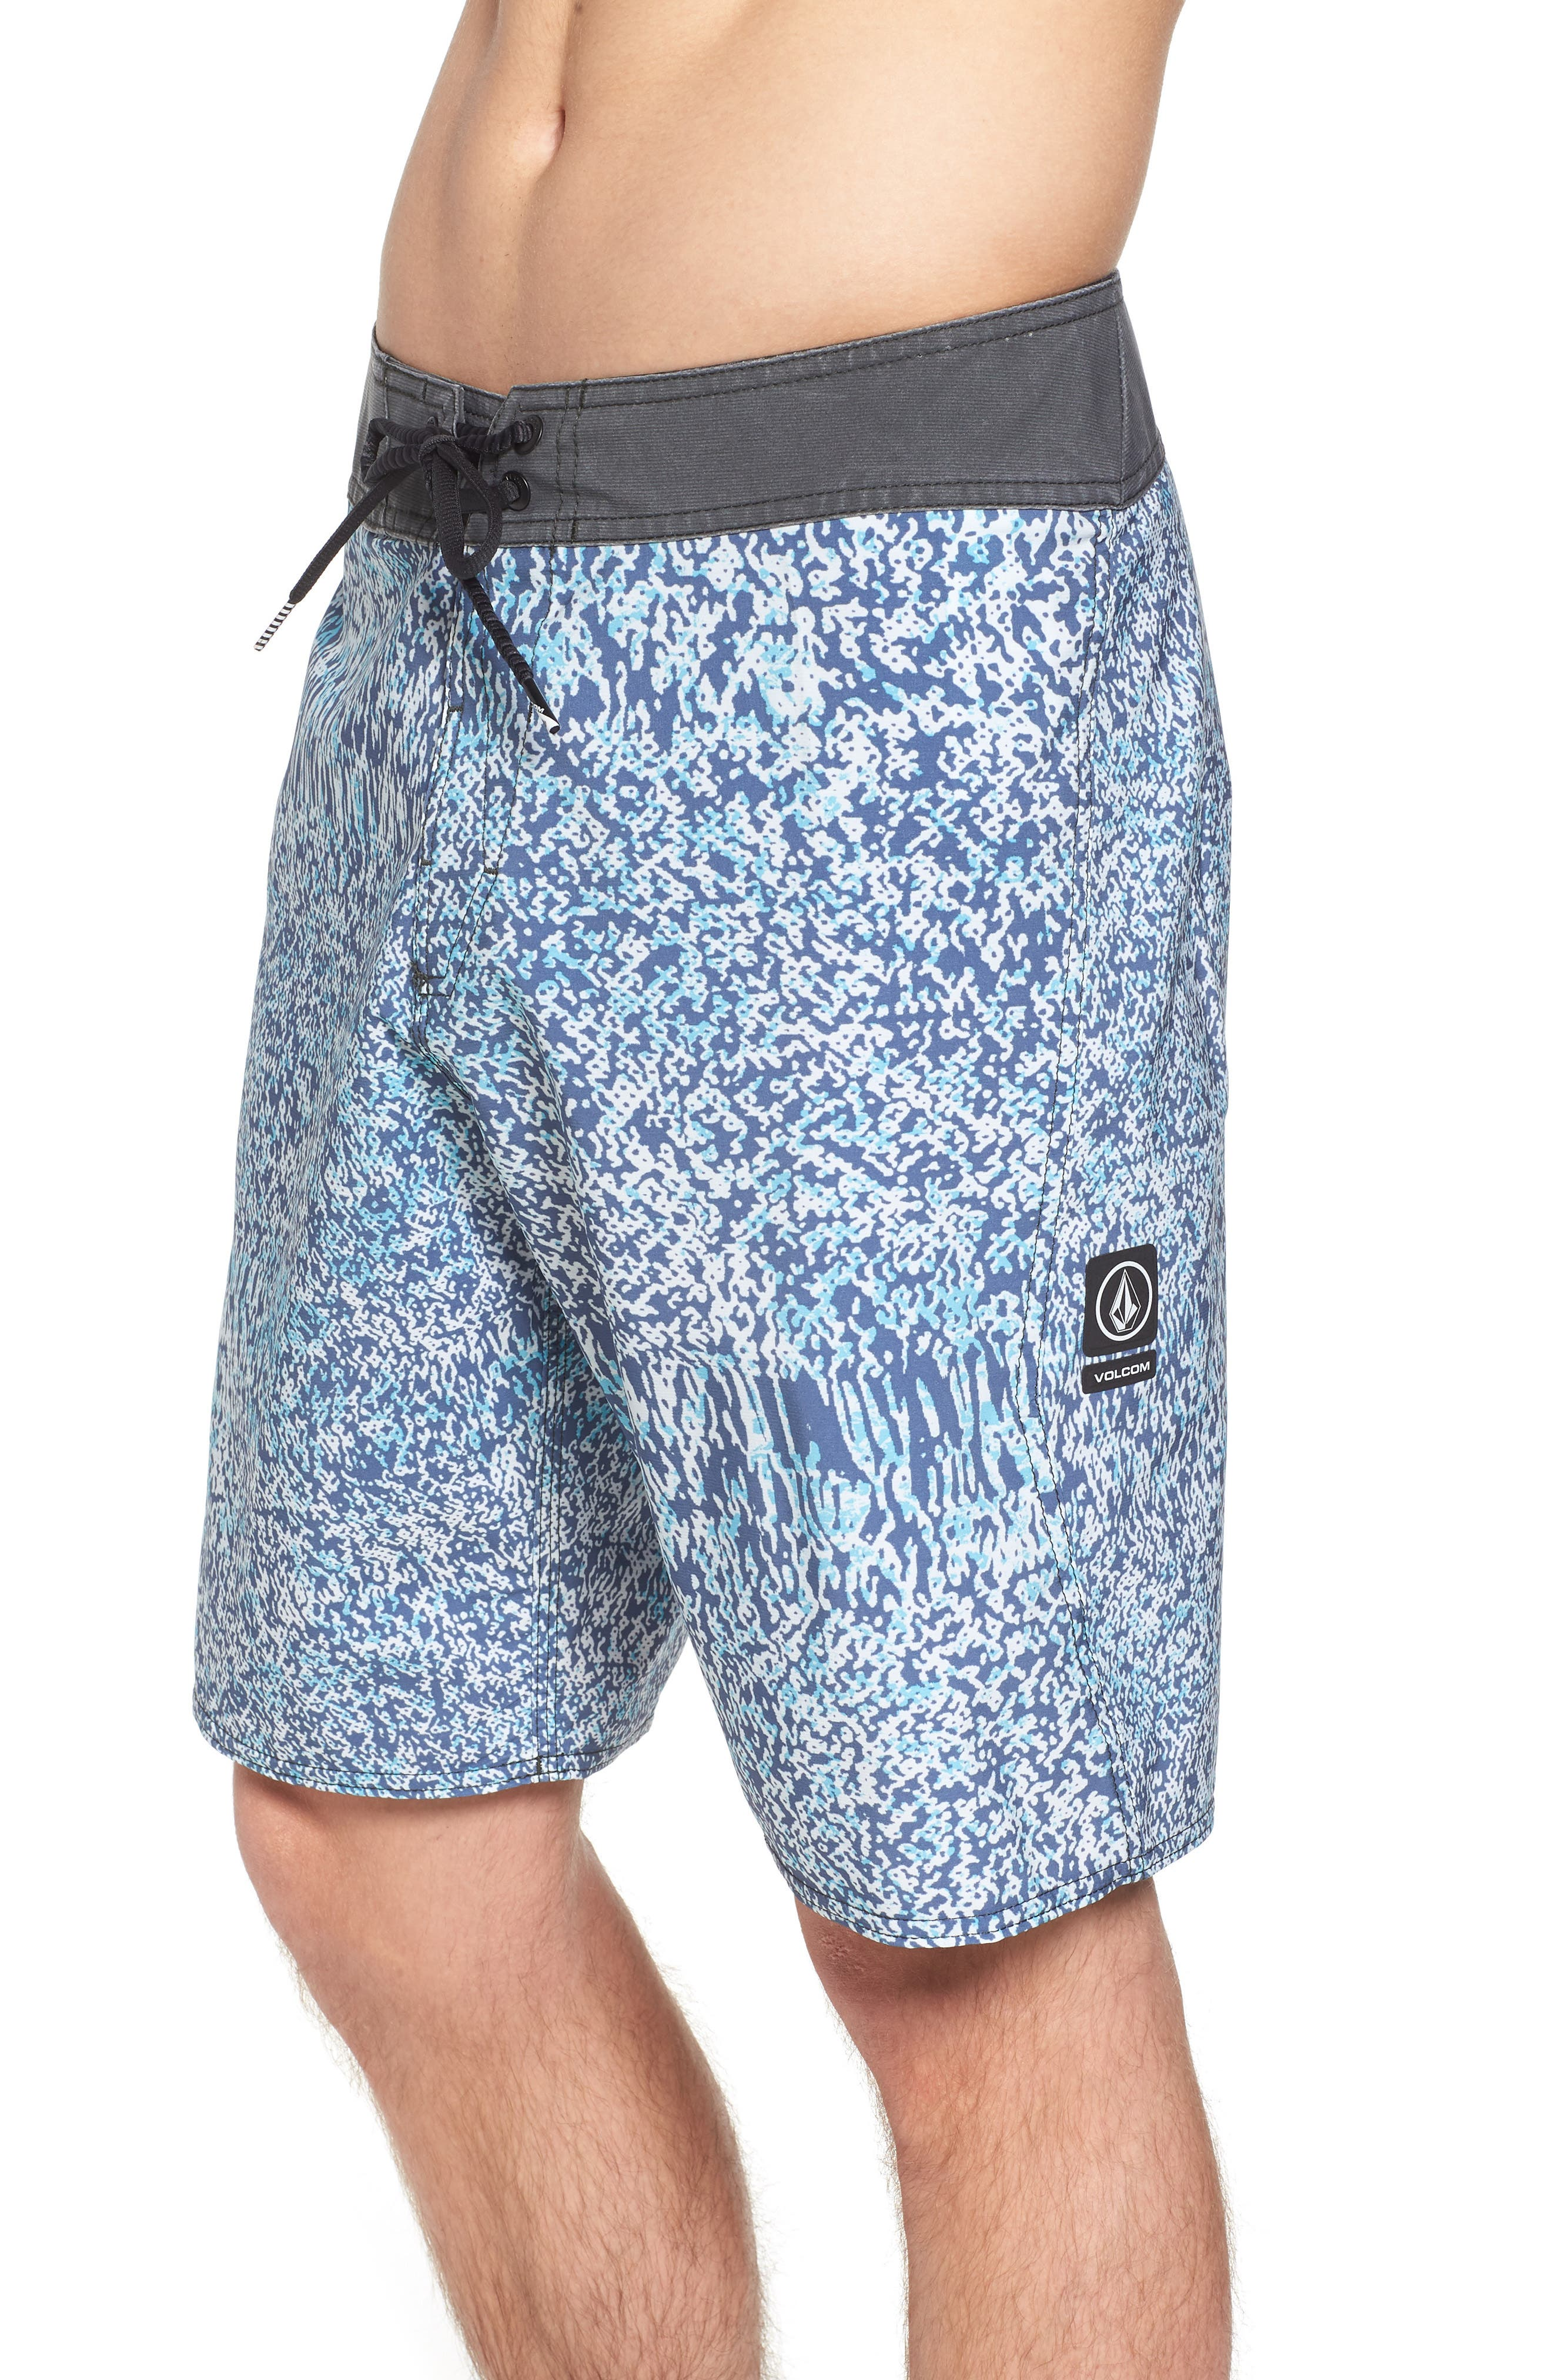 Plasm Mod Board Shorts,                             Alternate thumbnail 16, color,